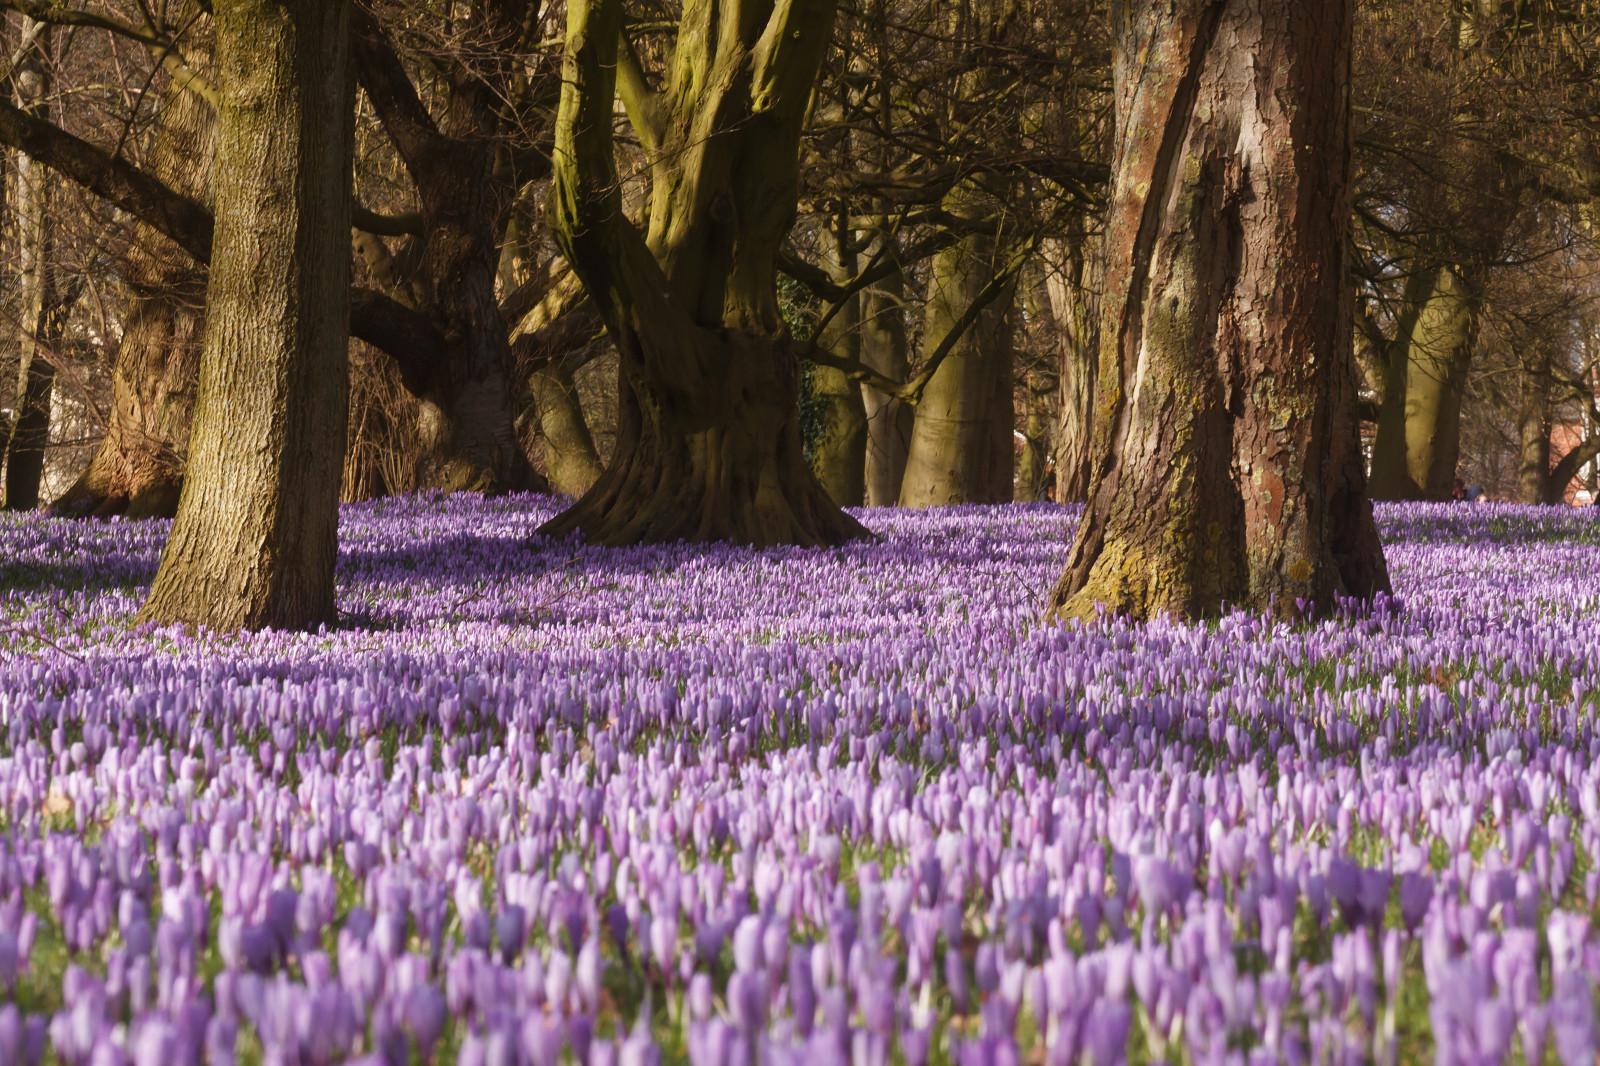 Wallpaper : landscape, forest, grass, field, purple, branch, blossom, spring, crocus, tree ...